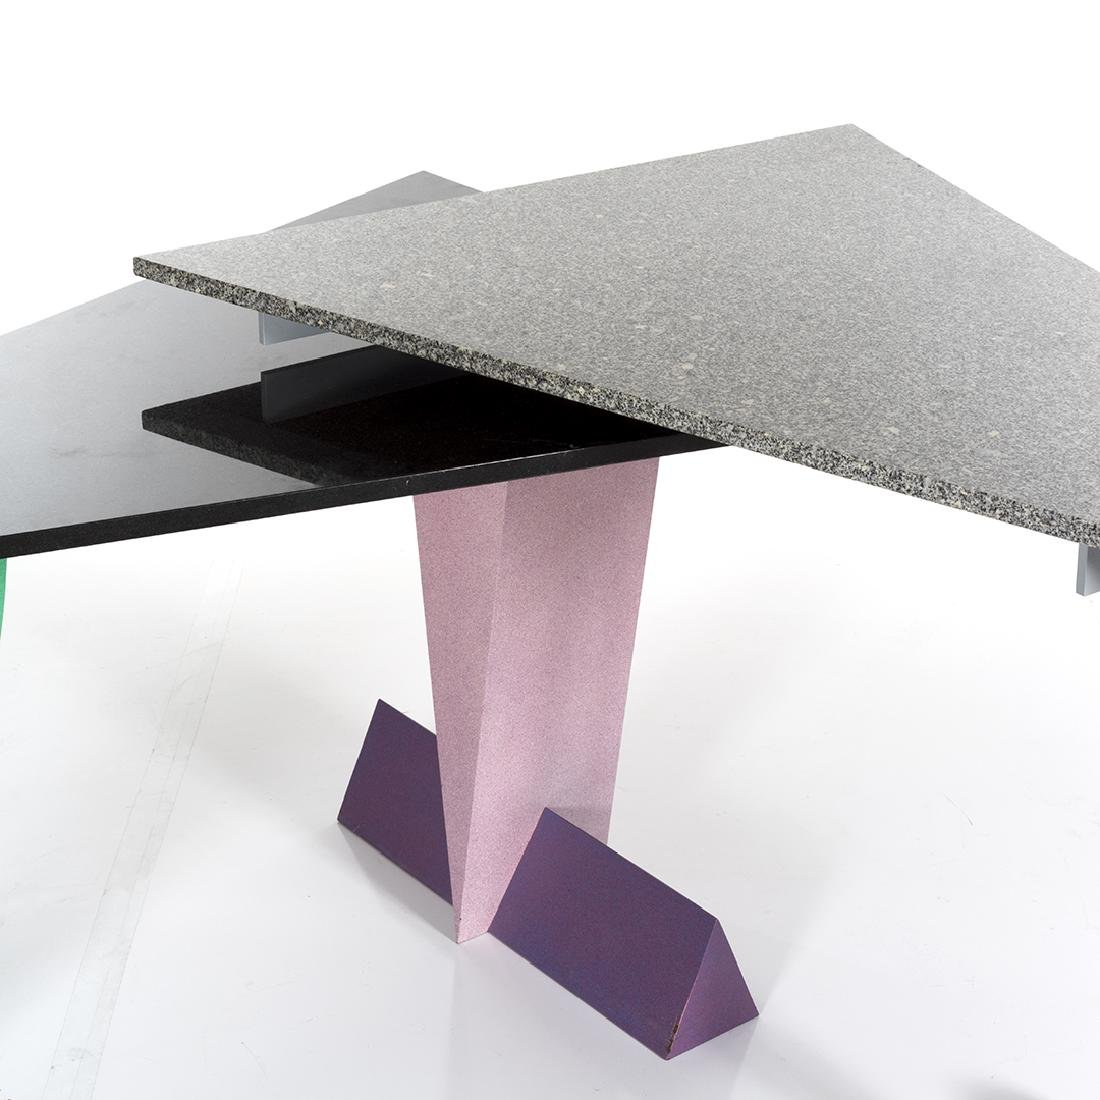 Peter Shire Desk - 3